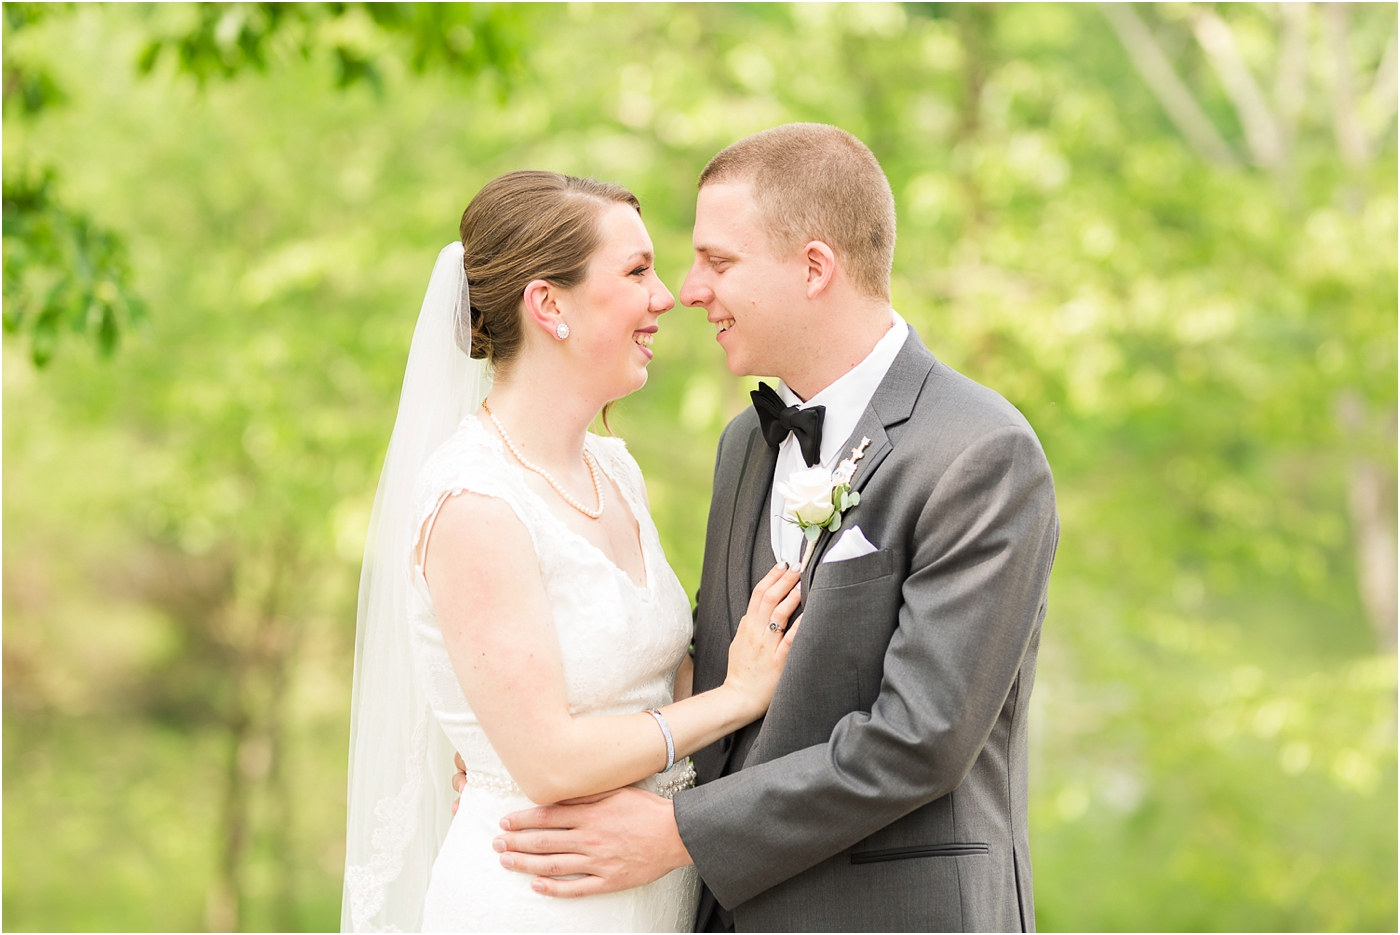 Gettysburg-lodges-wedding-photos-42.jpg